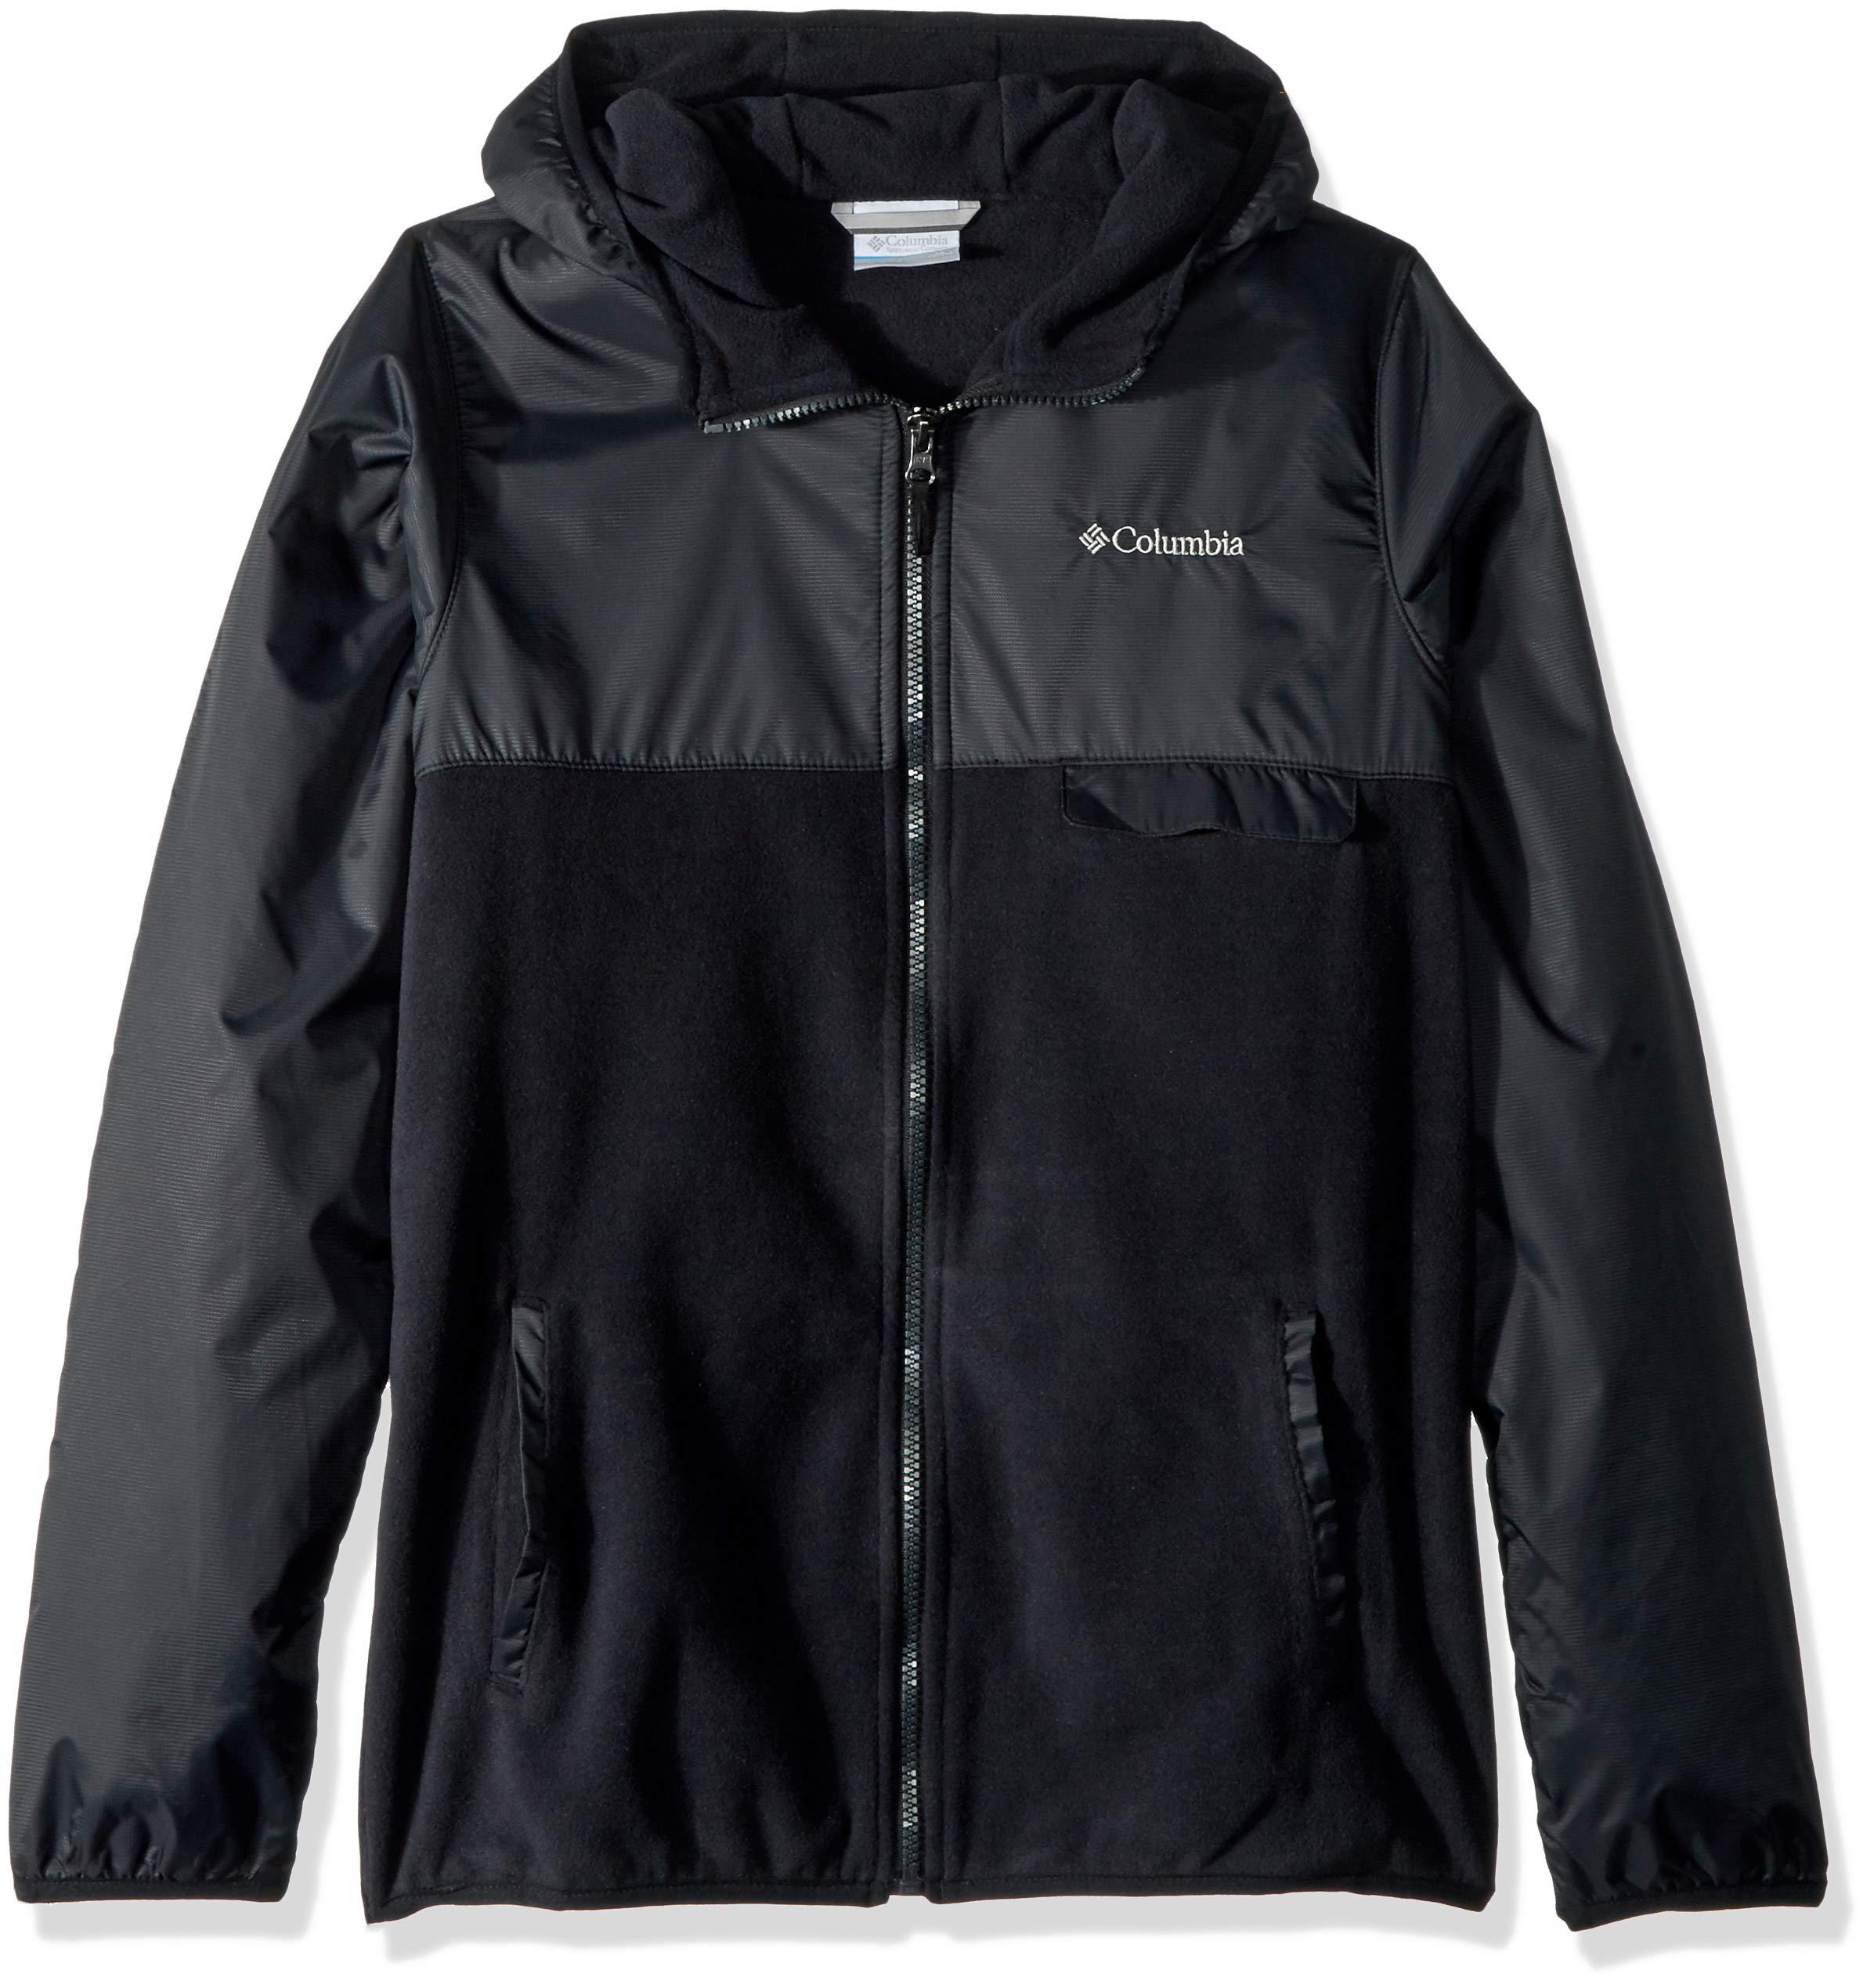 Columbia Little Boy's Mountain SideOverlay Full Zip Fleece, Small, Black